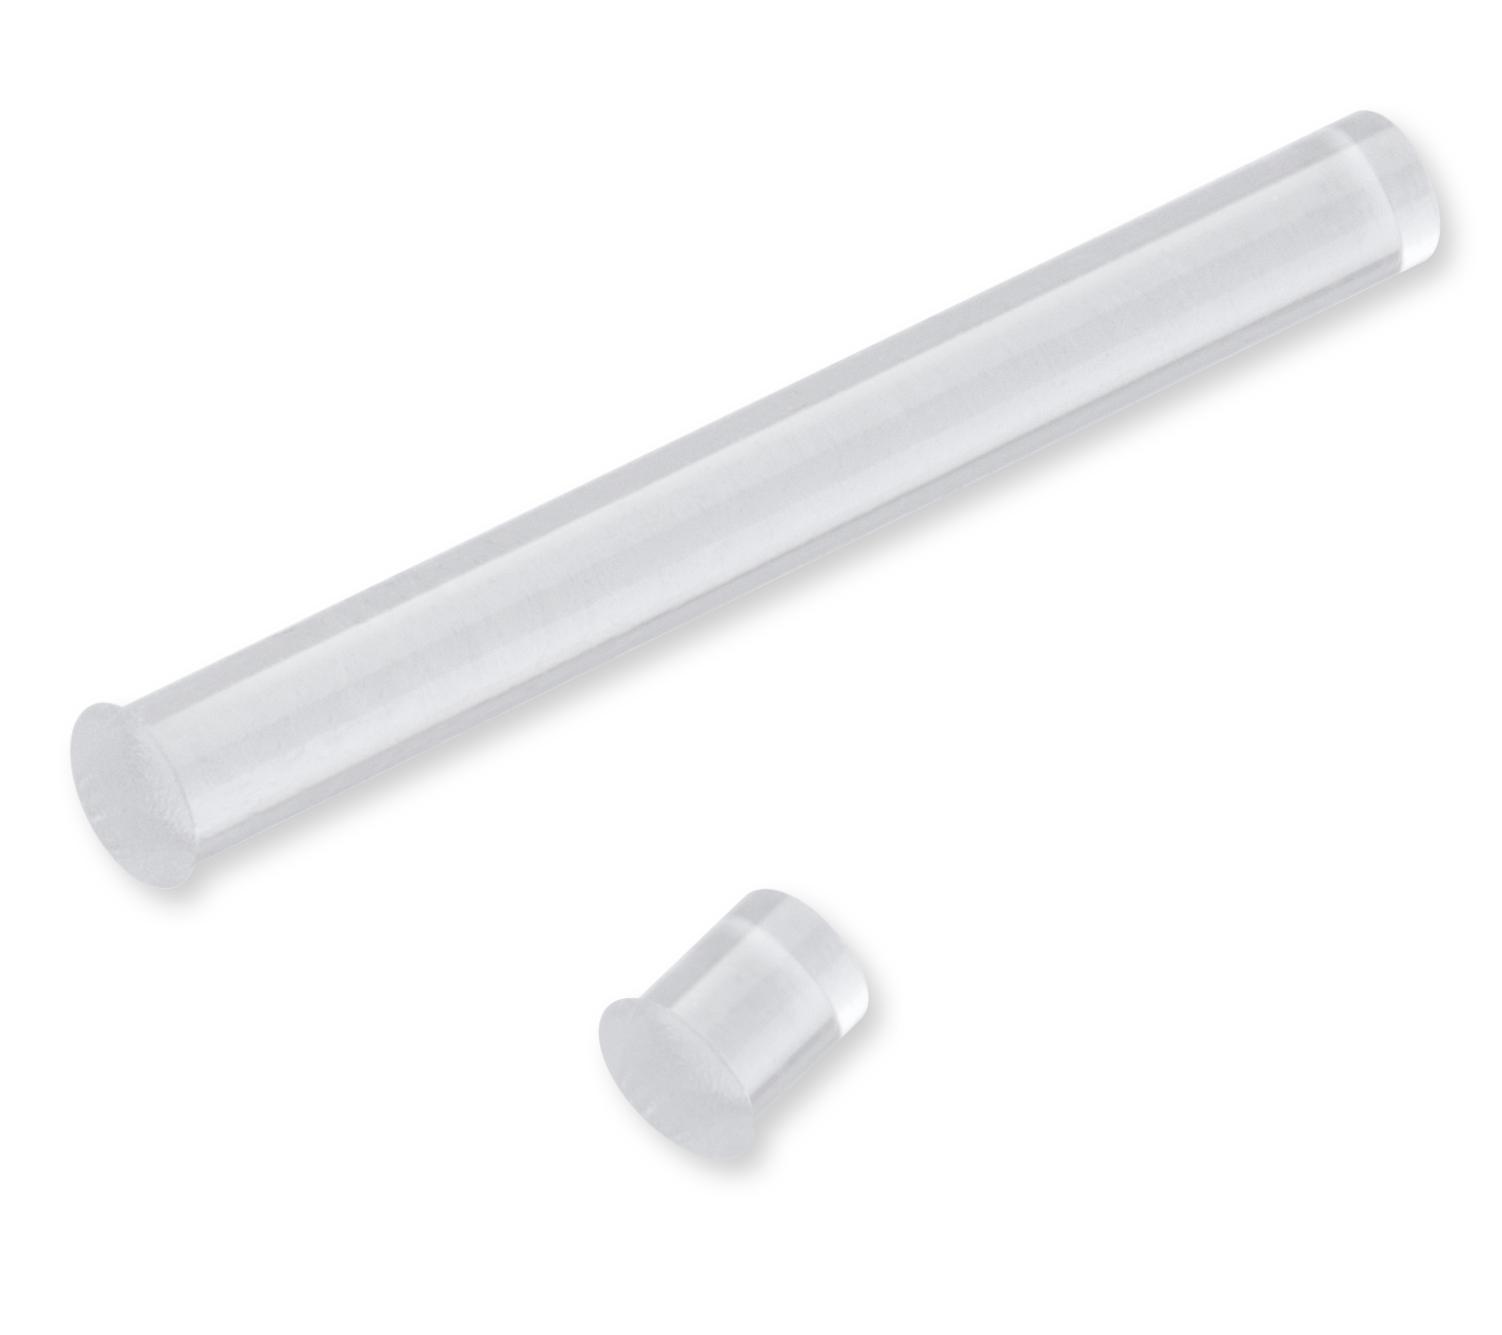 Press Fit, Low Profile Diffused Light Pipes - LFB/LFC (3mm